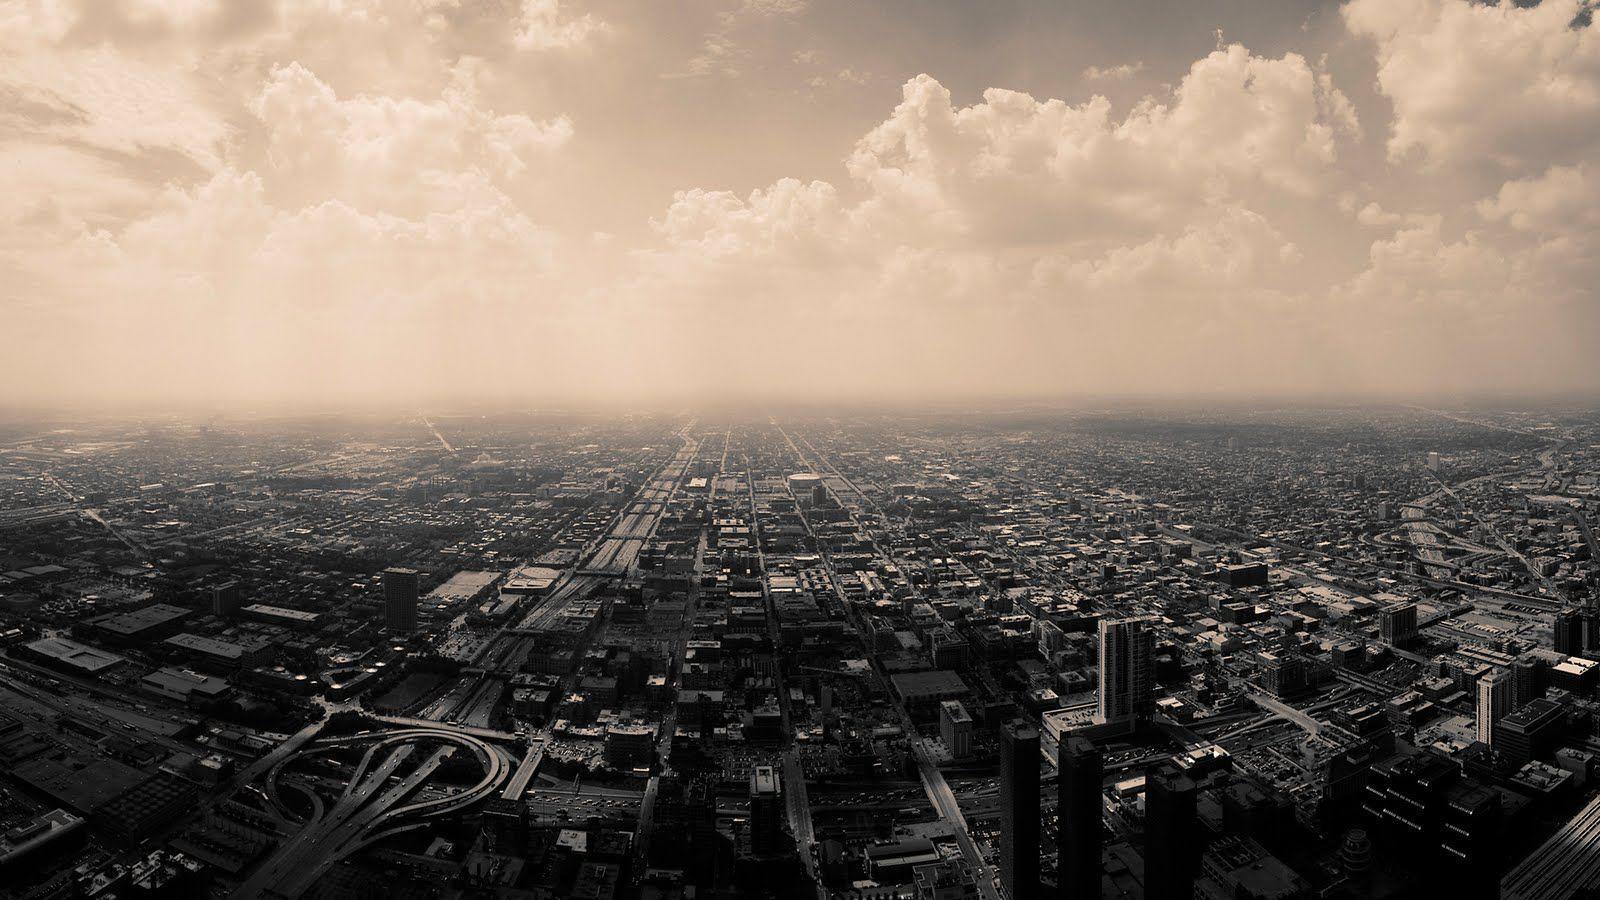 HD WALLPAPERS: Download Dubai City HD Wallpapers 1080p | City ...